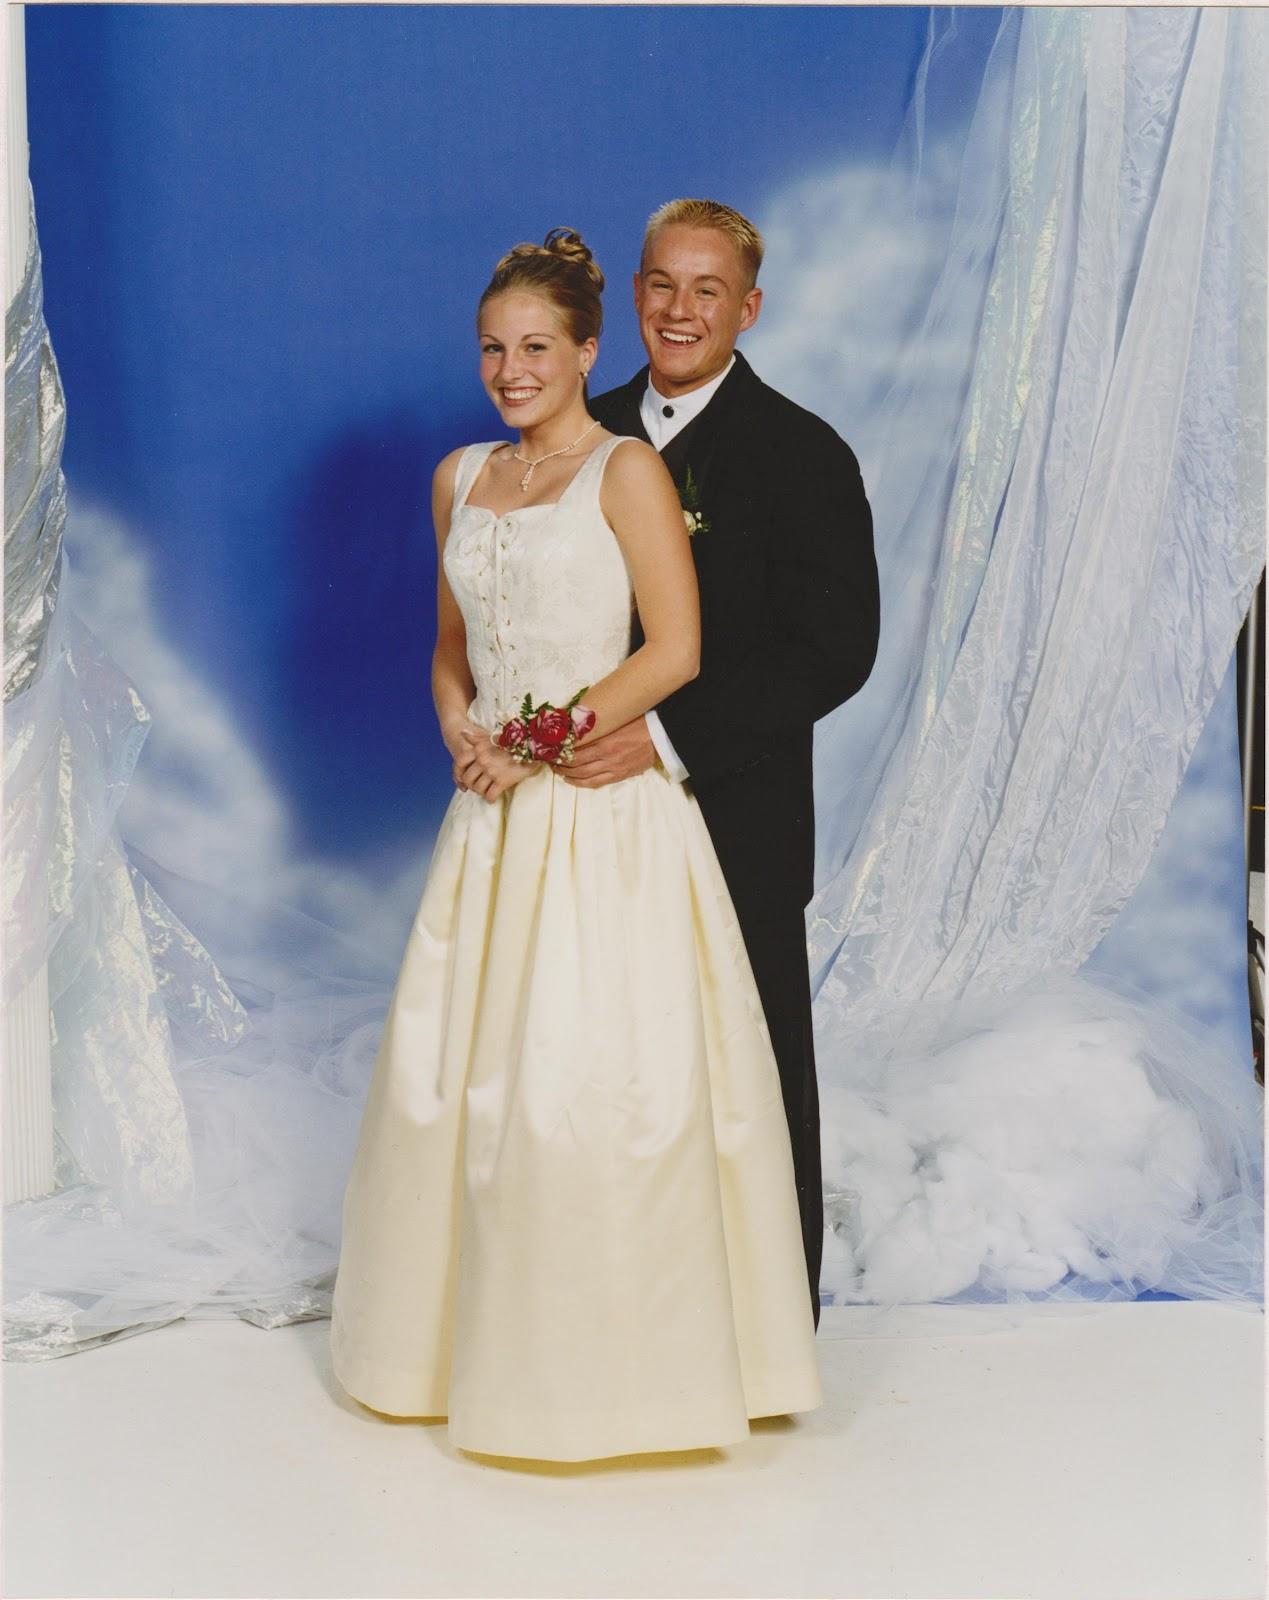 Dresses in 1999